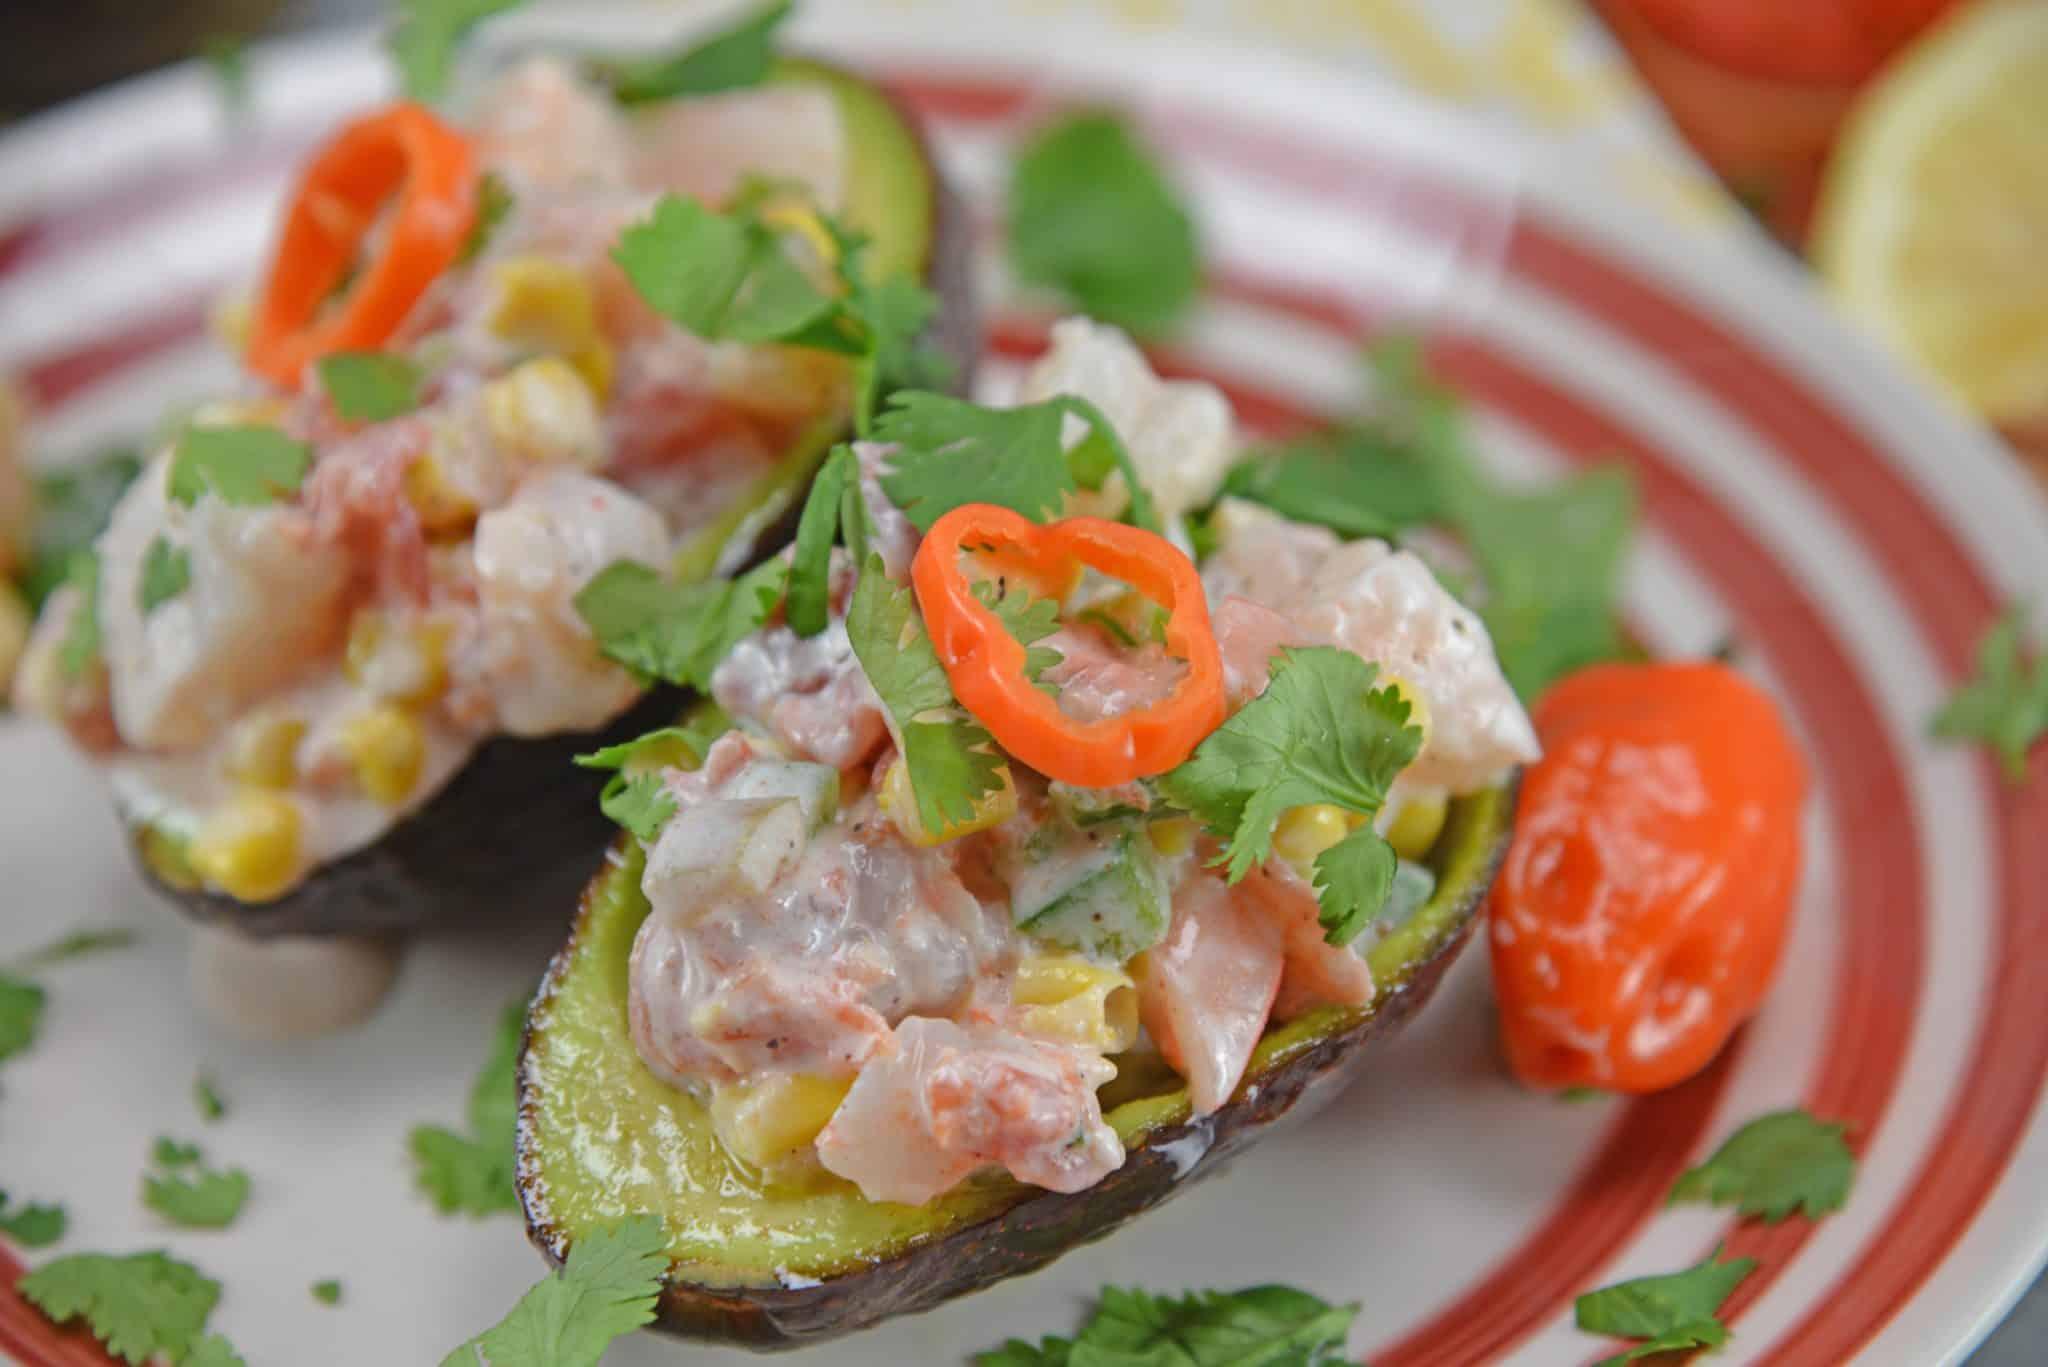 Zesty Shrimp Salad Avocados are an easy, no-cook recipe using shrimp, corn, tomatoes & bell pepper with a zesty yogurt sauce served in avocado halves. #shrimpsalad #avocadorecipes www.savoryexperiments.com